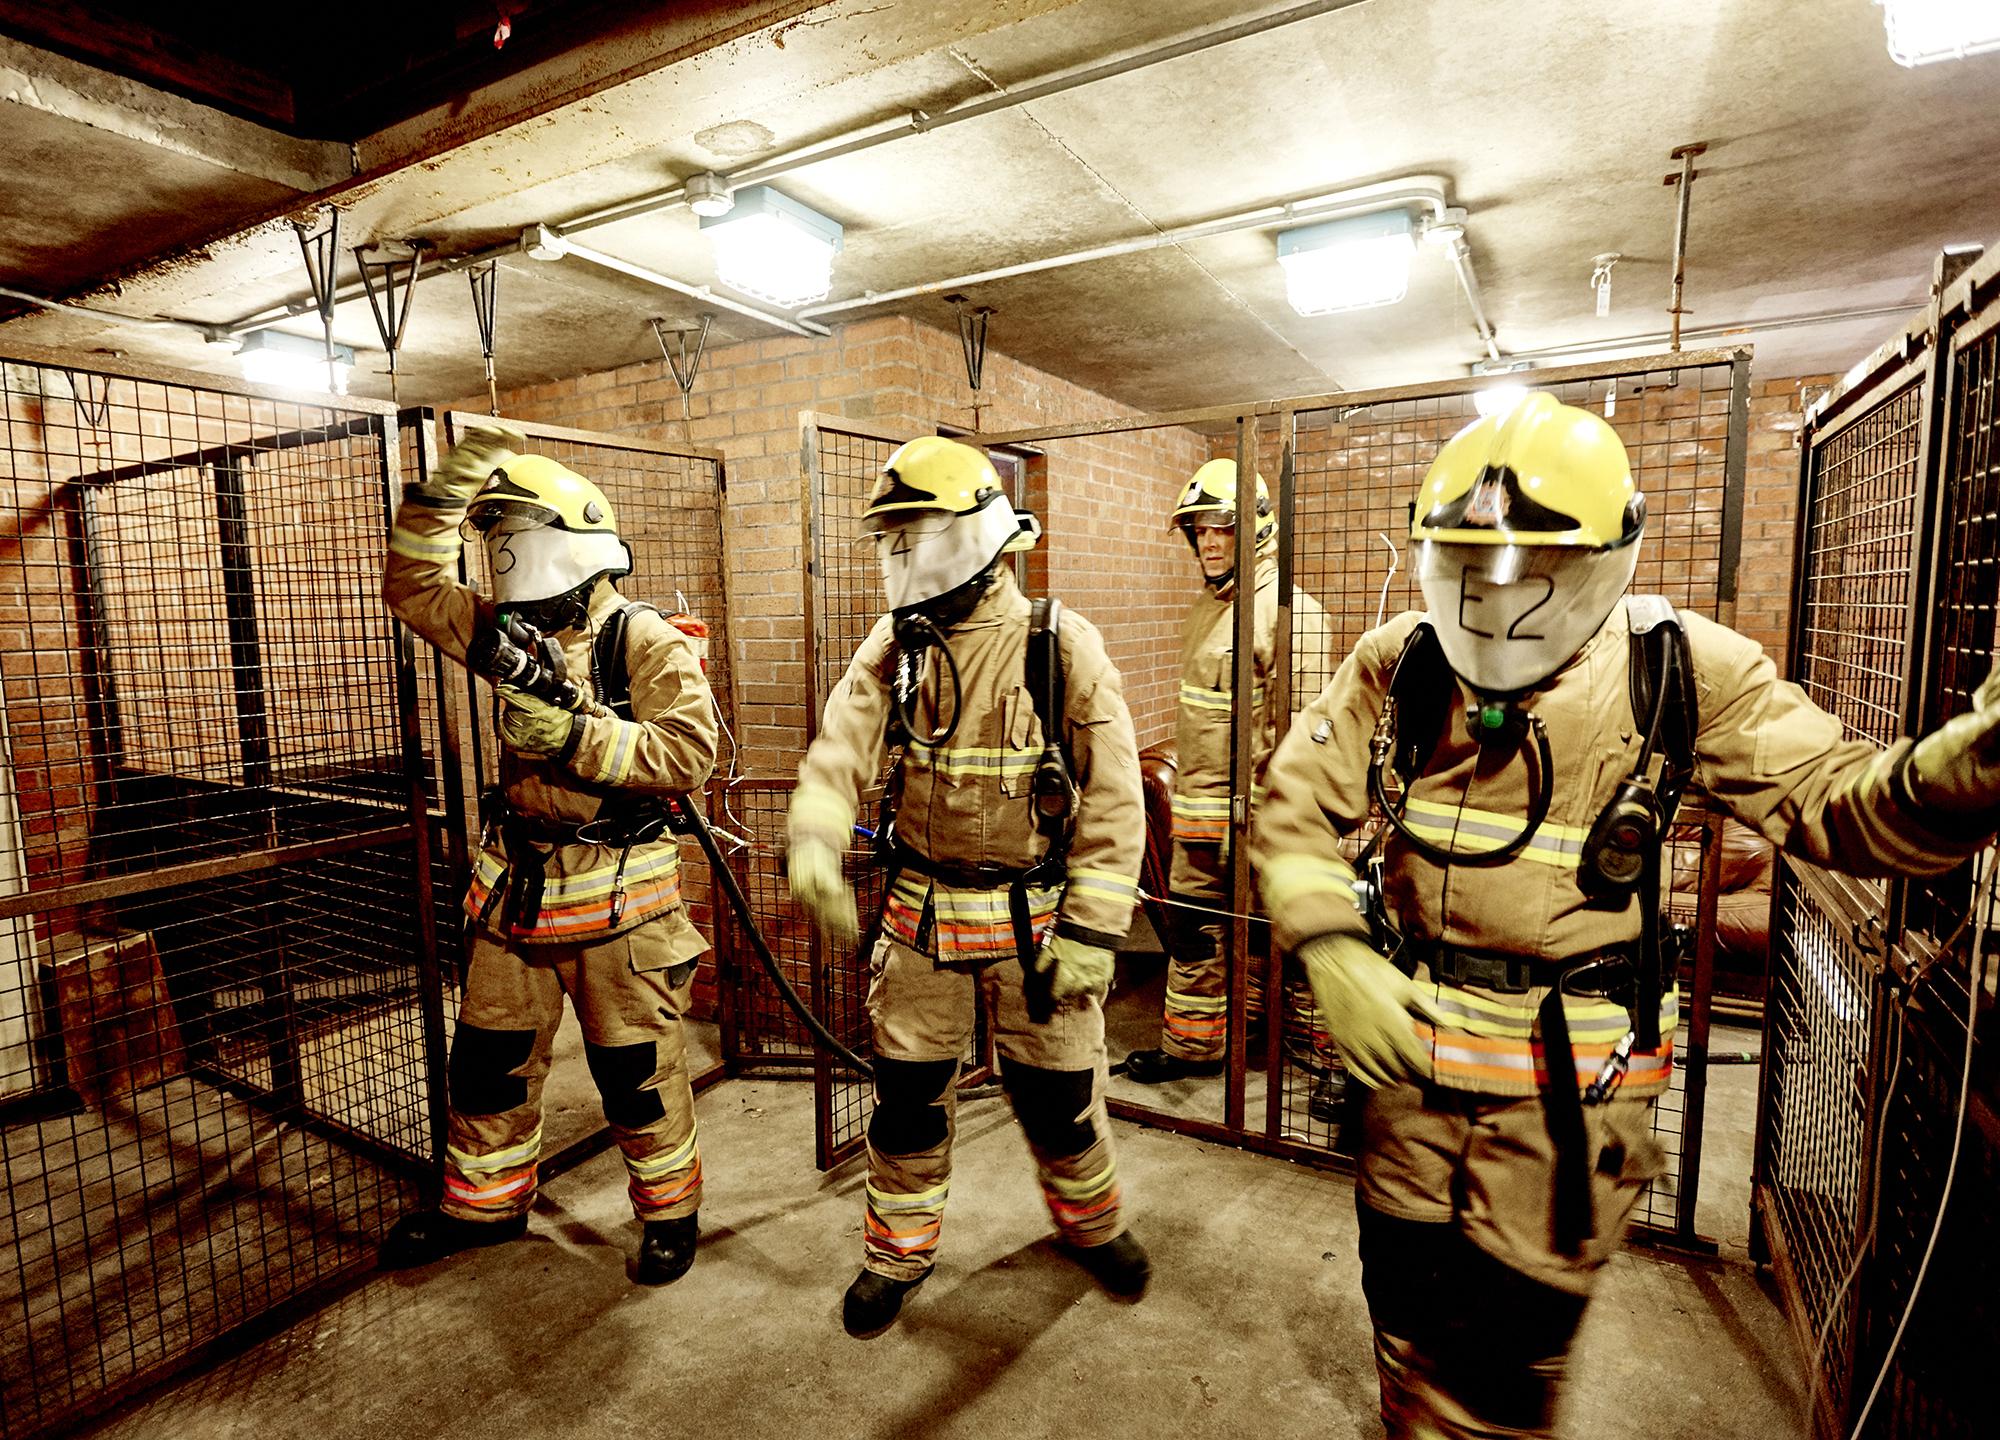 John Donoghue - firefighters